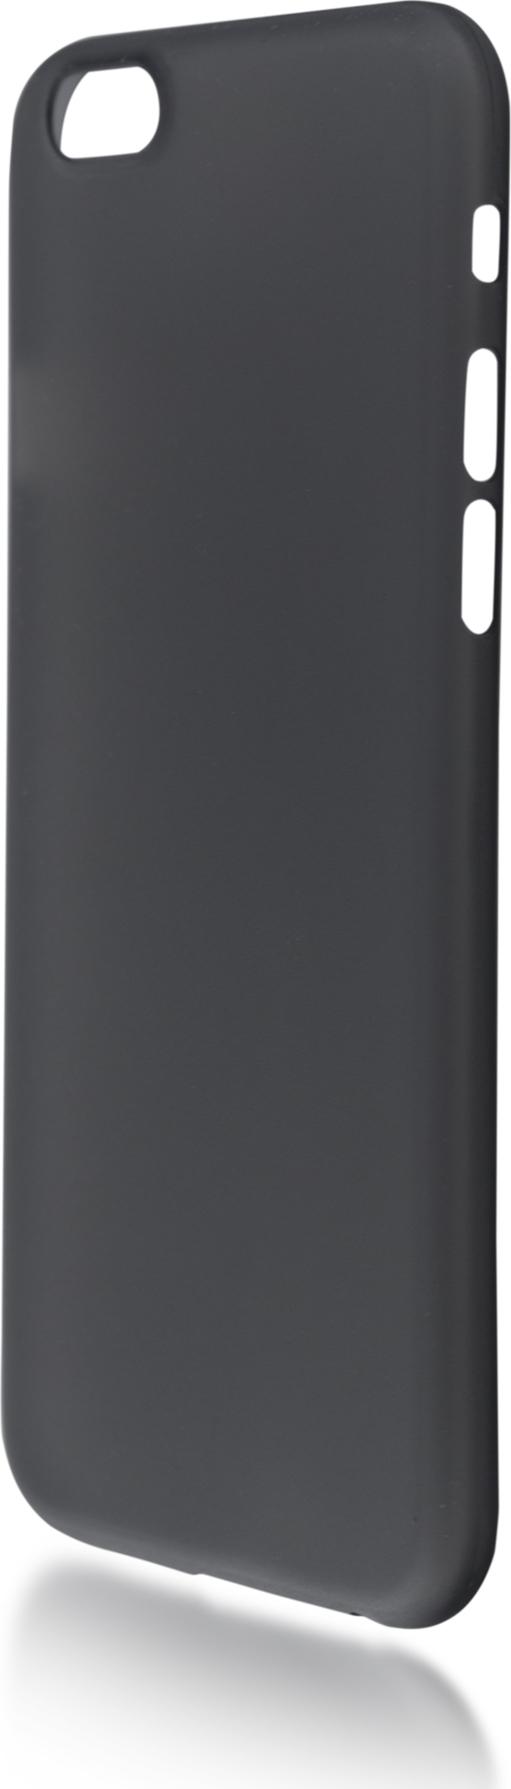 Чехол Brosco SuperSlim для Apple iPhone 6, черный чехол для сотового телефона brosco superslim для iphone 6 plus ip6p pp superslim blue голубой